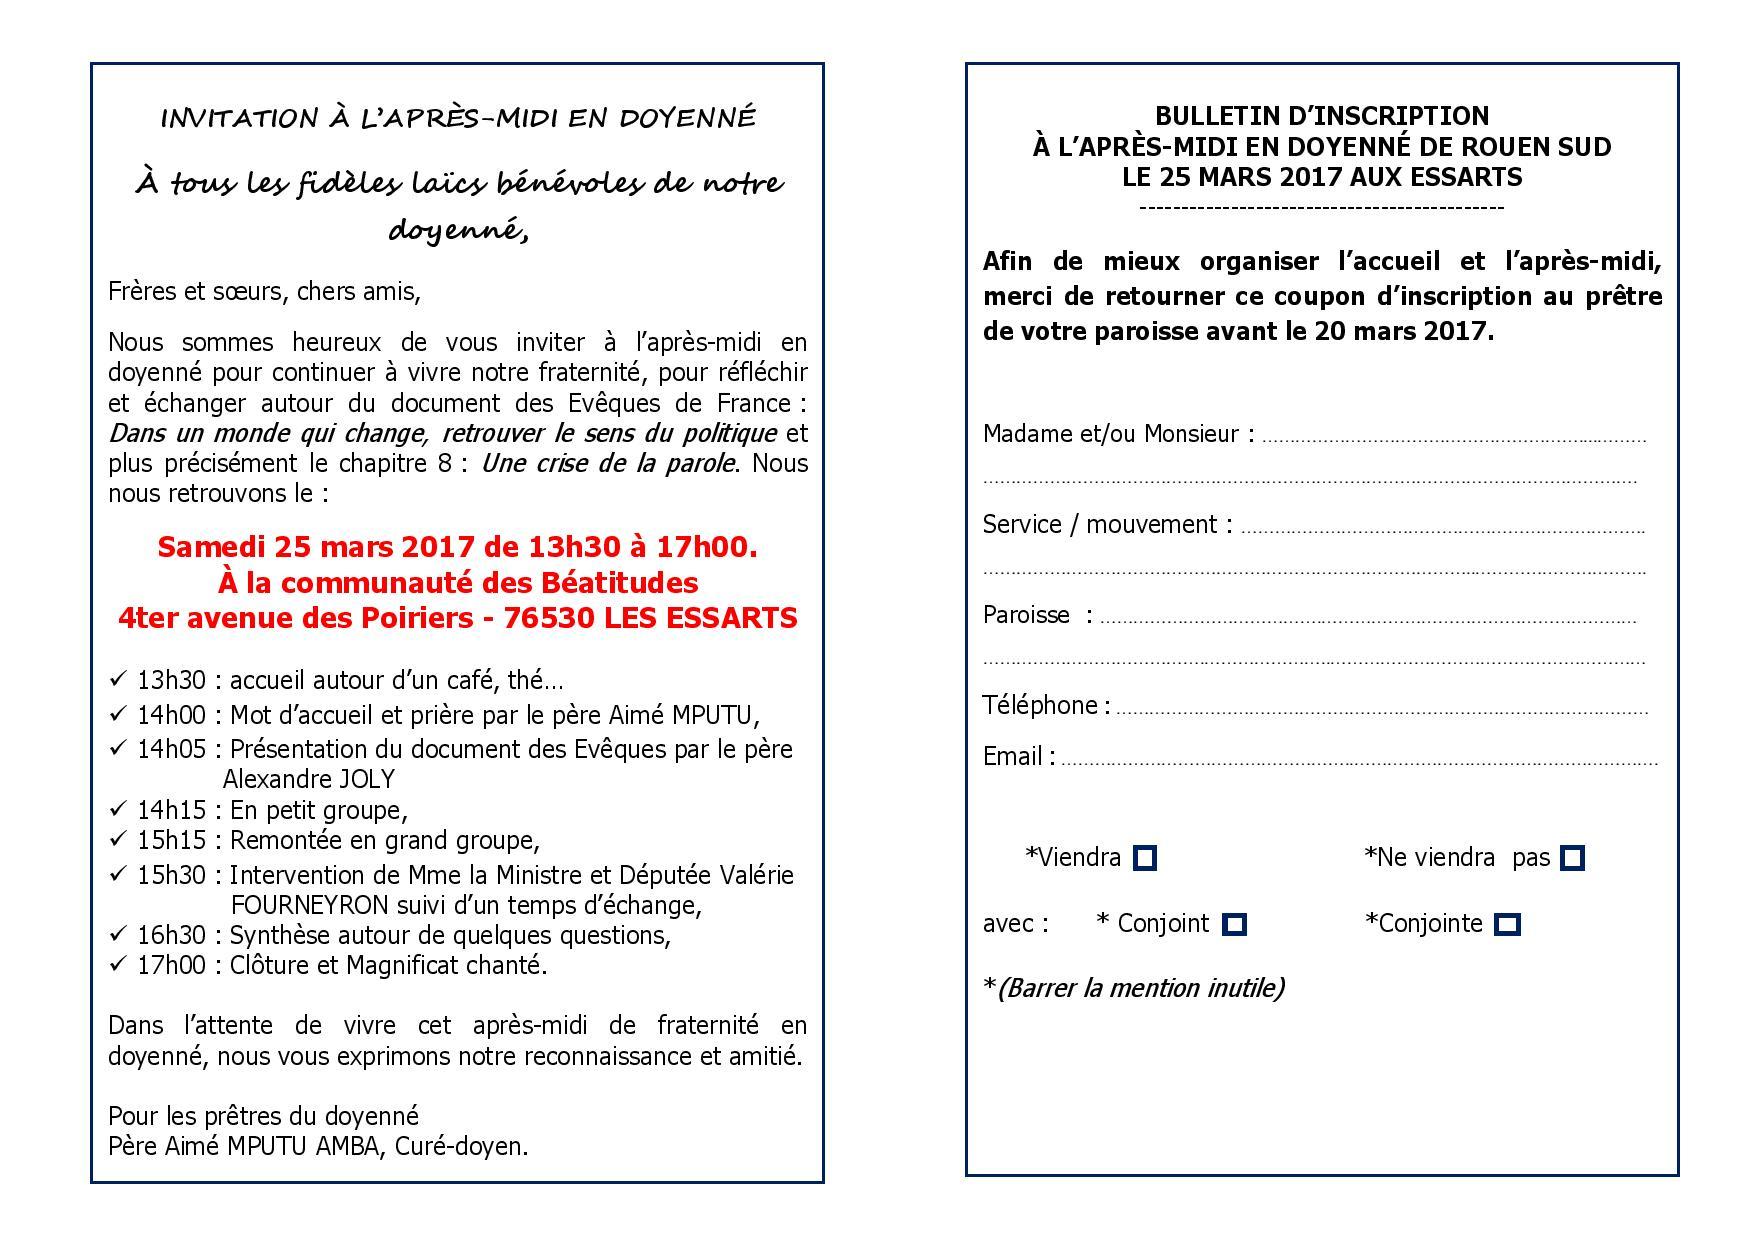 Invitation laïcs 2017-03-25-Bénévoles doyenné Essarts-1-page-002